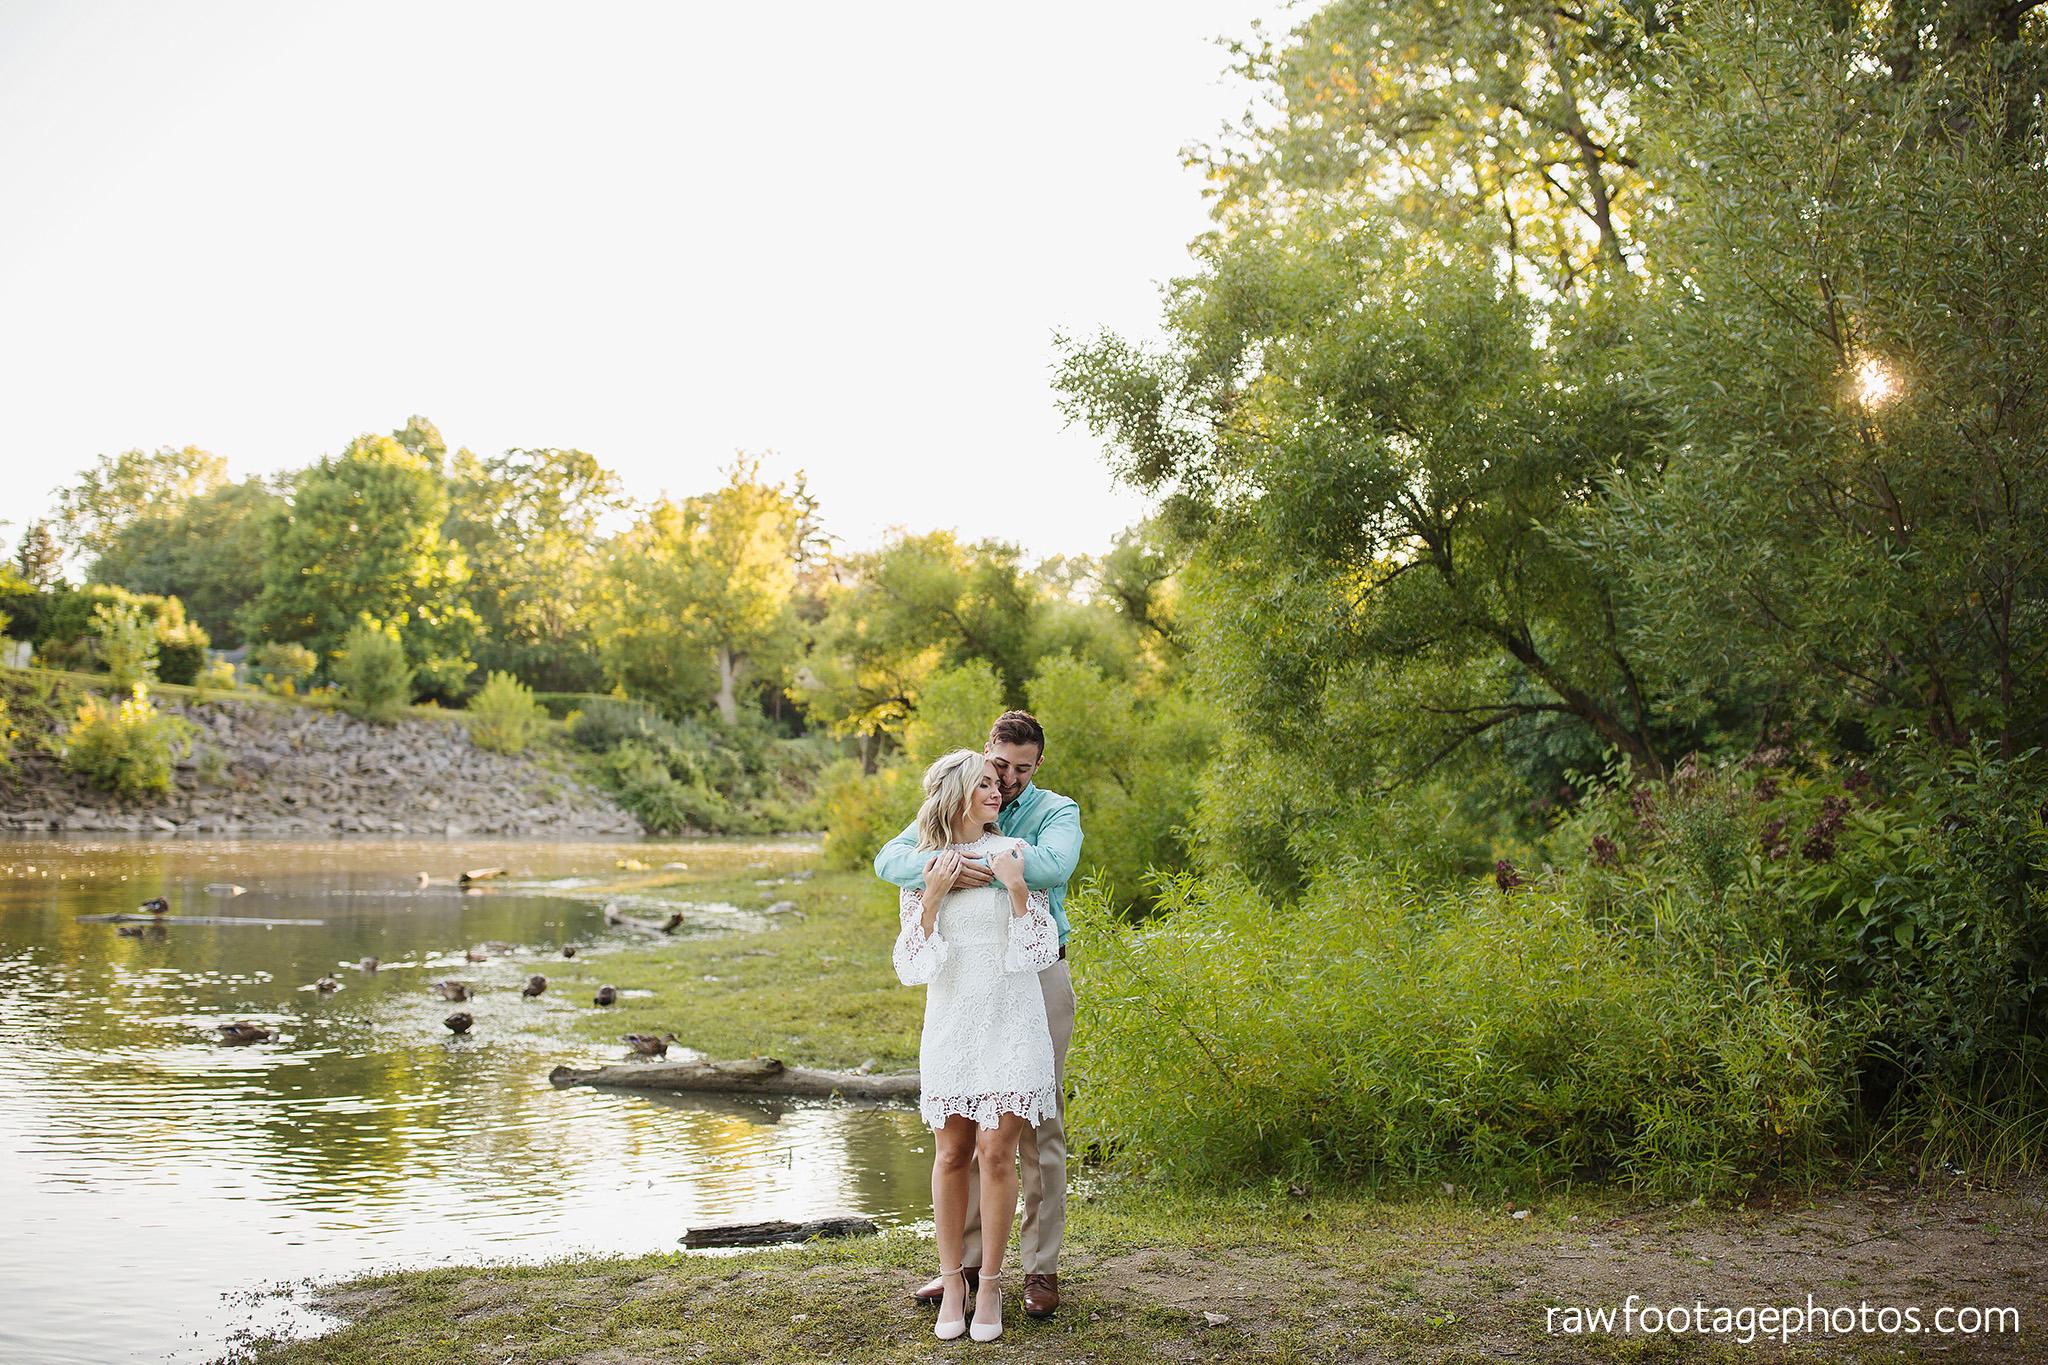 london_ontario_wedding_photographer-raw_footage_photography-engagement_session-uwo-campus-gibbons_park-woods017.jpg